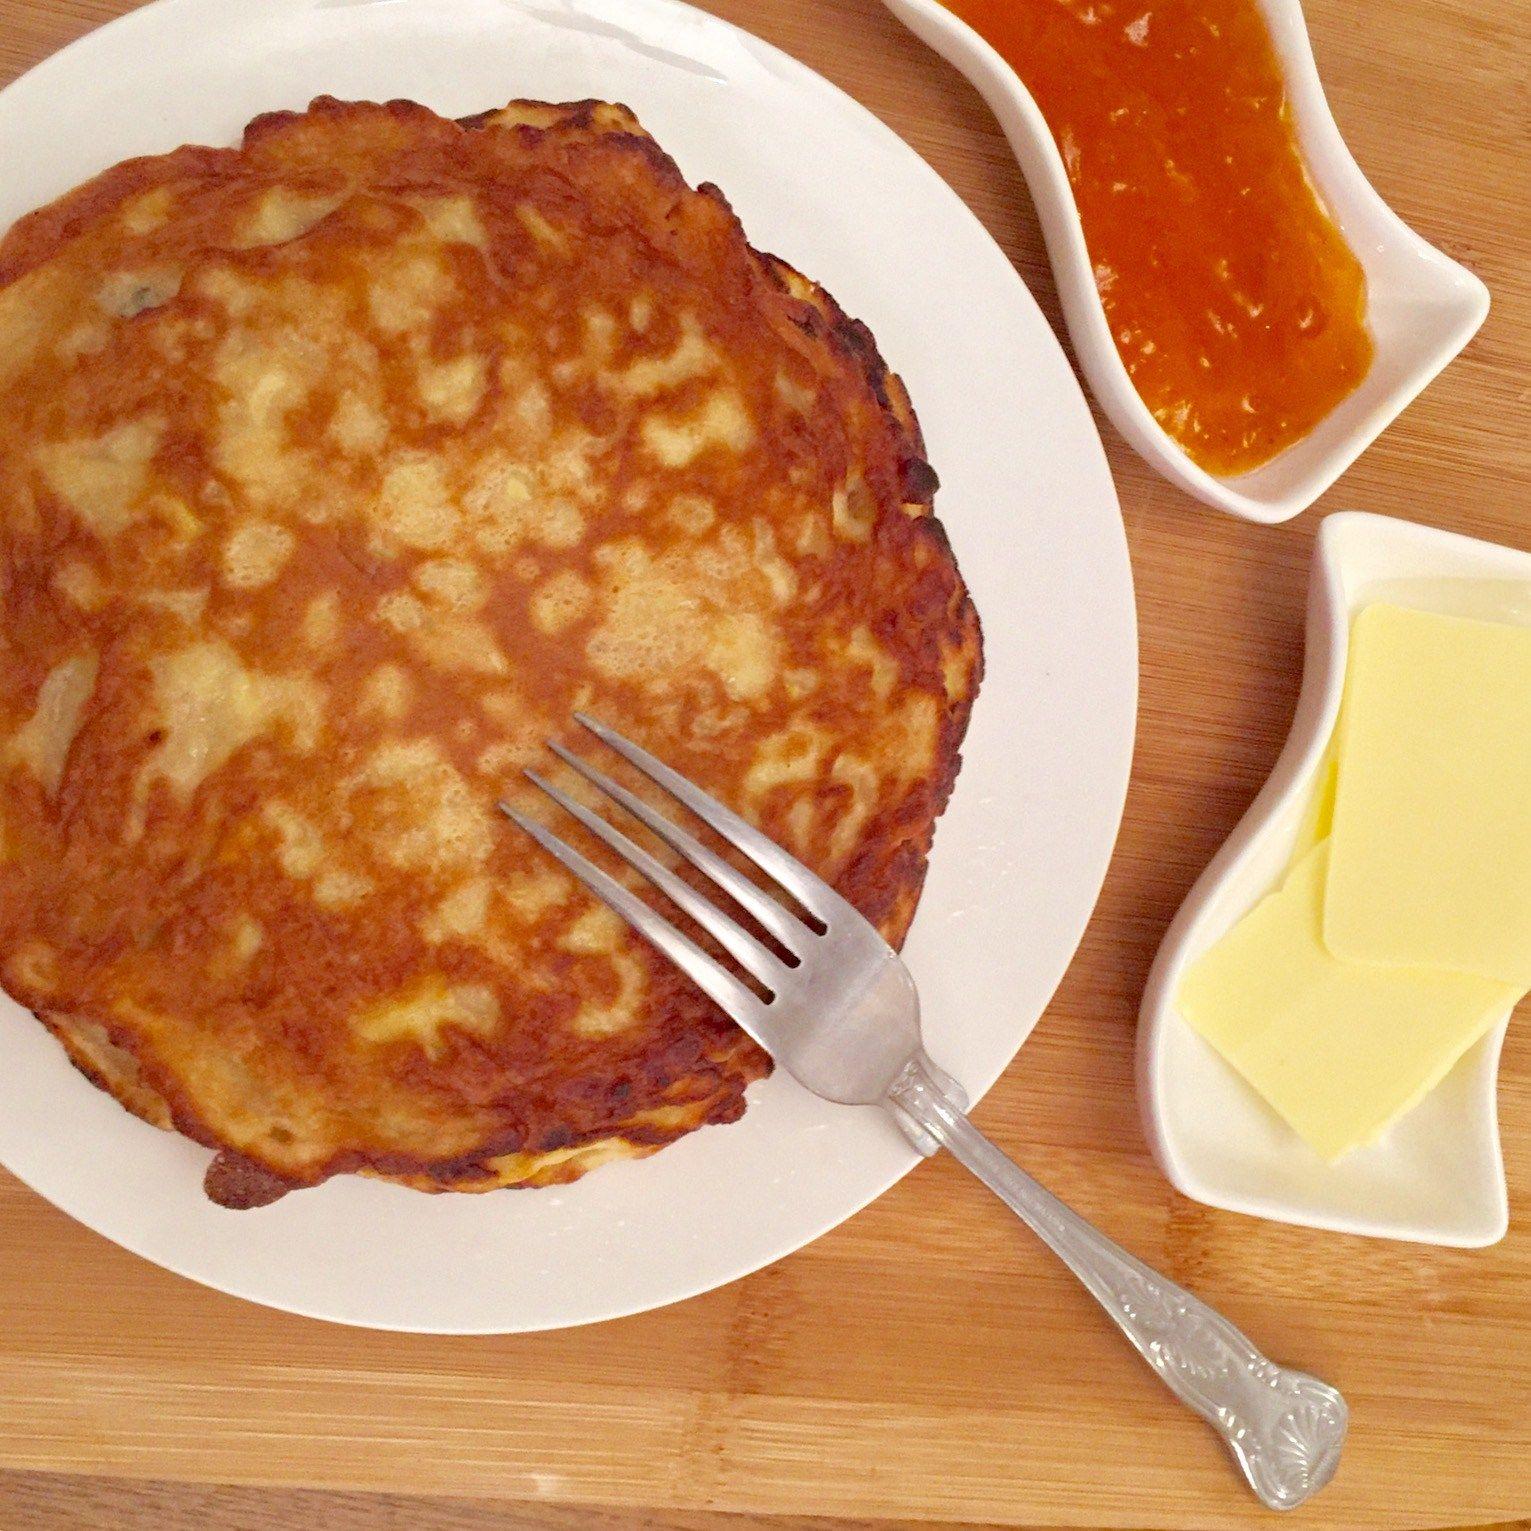 Easy-Peasy Low-Sugar Apple Pancakes With Cinnamon www.captainbobcat.com